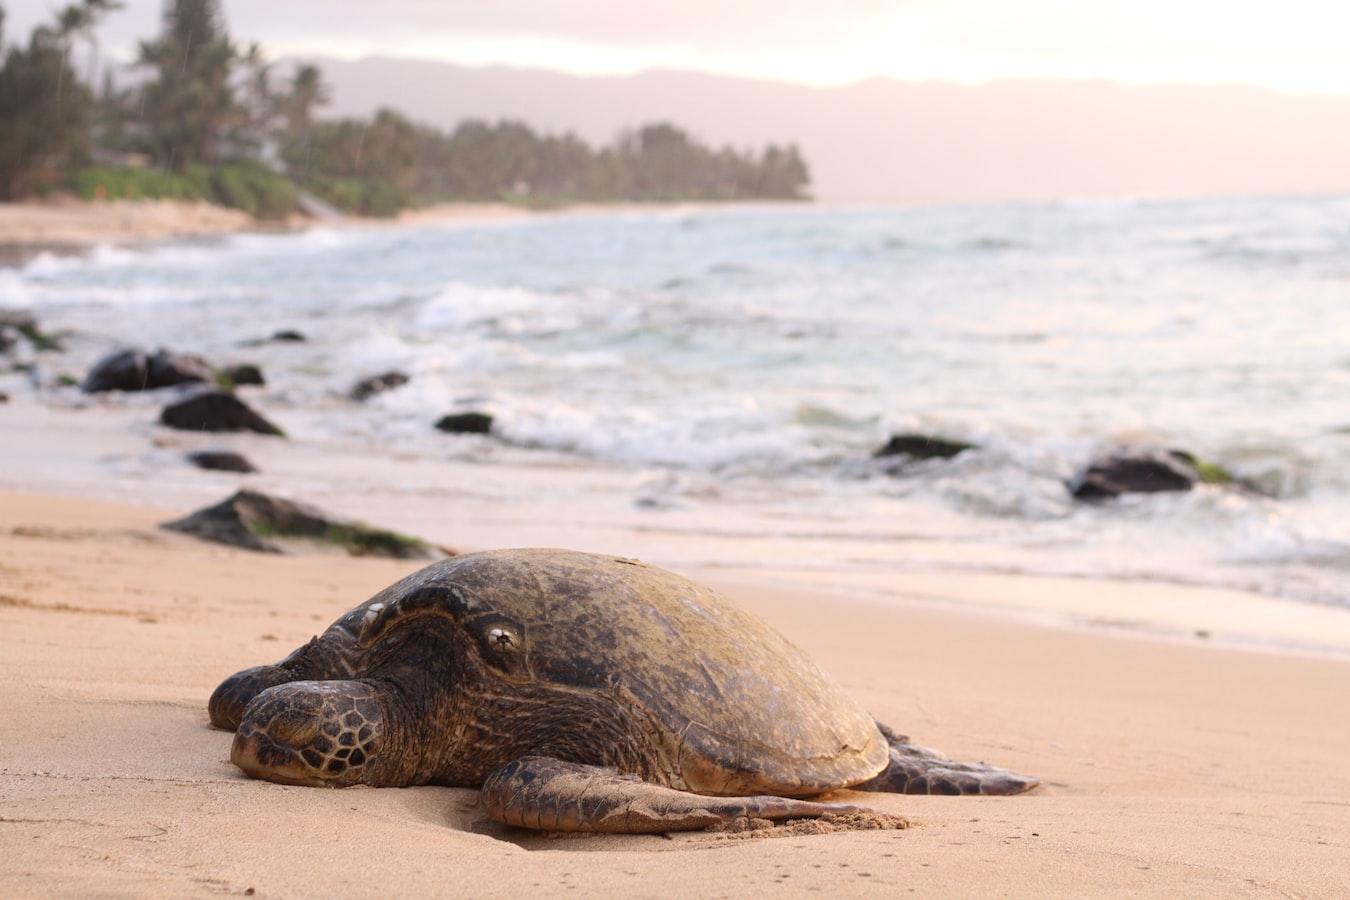 kostaryka tortuguero zolwie morskie